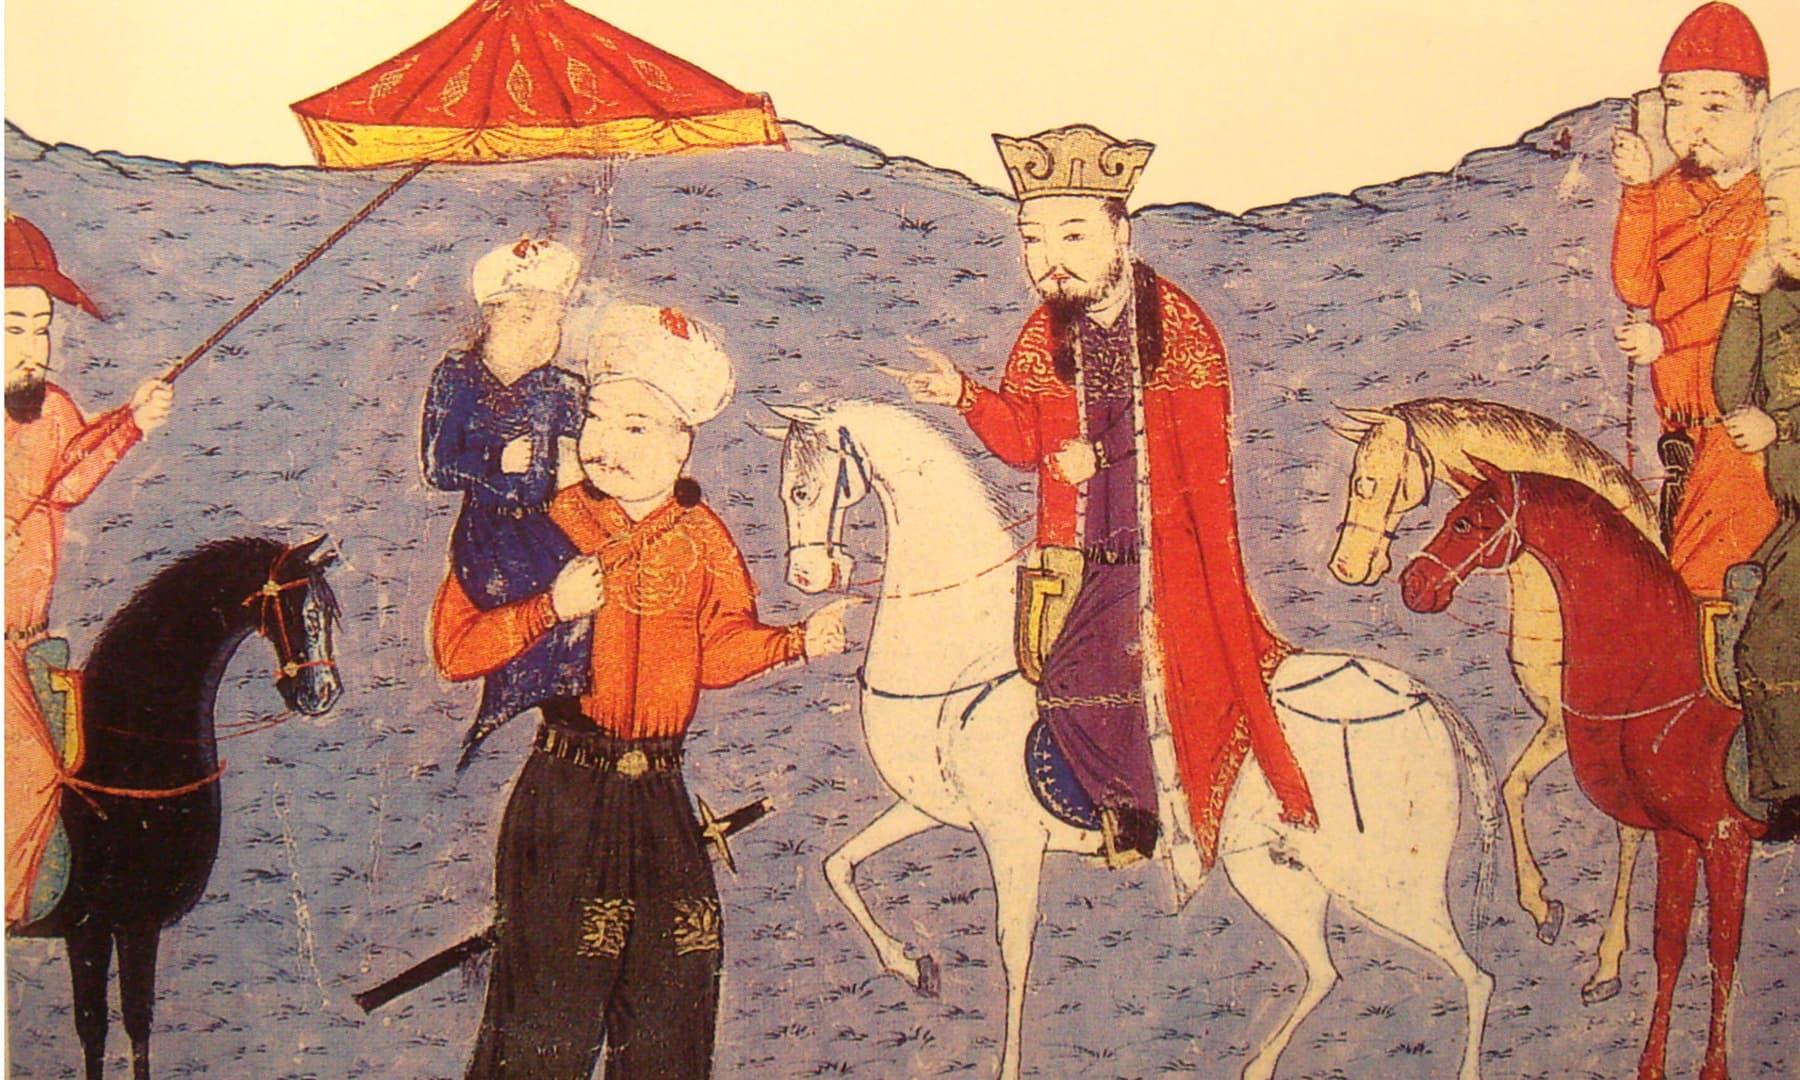 ارغون خان، ایل خانی حکومت کا چوتھا حکمران